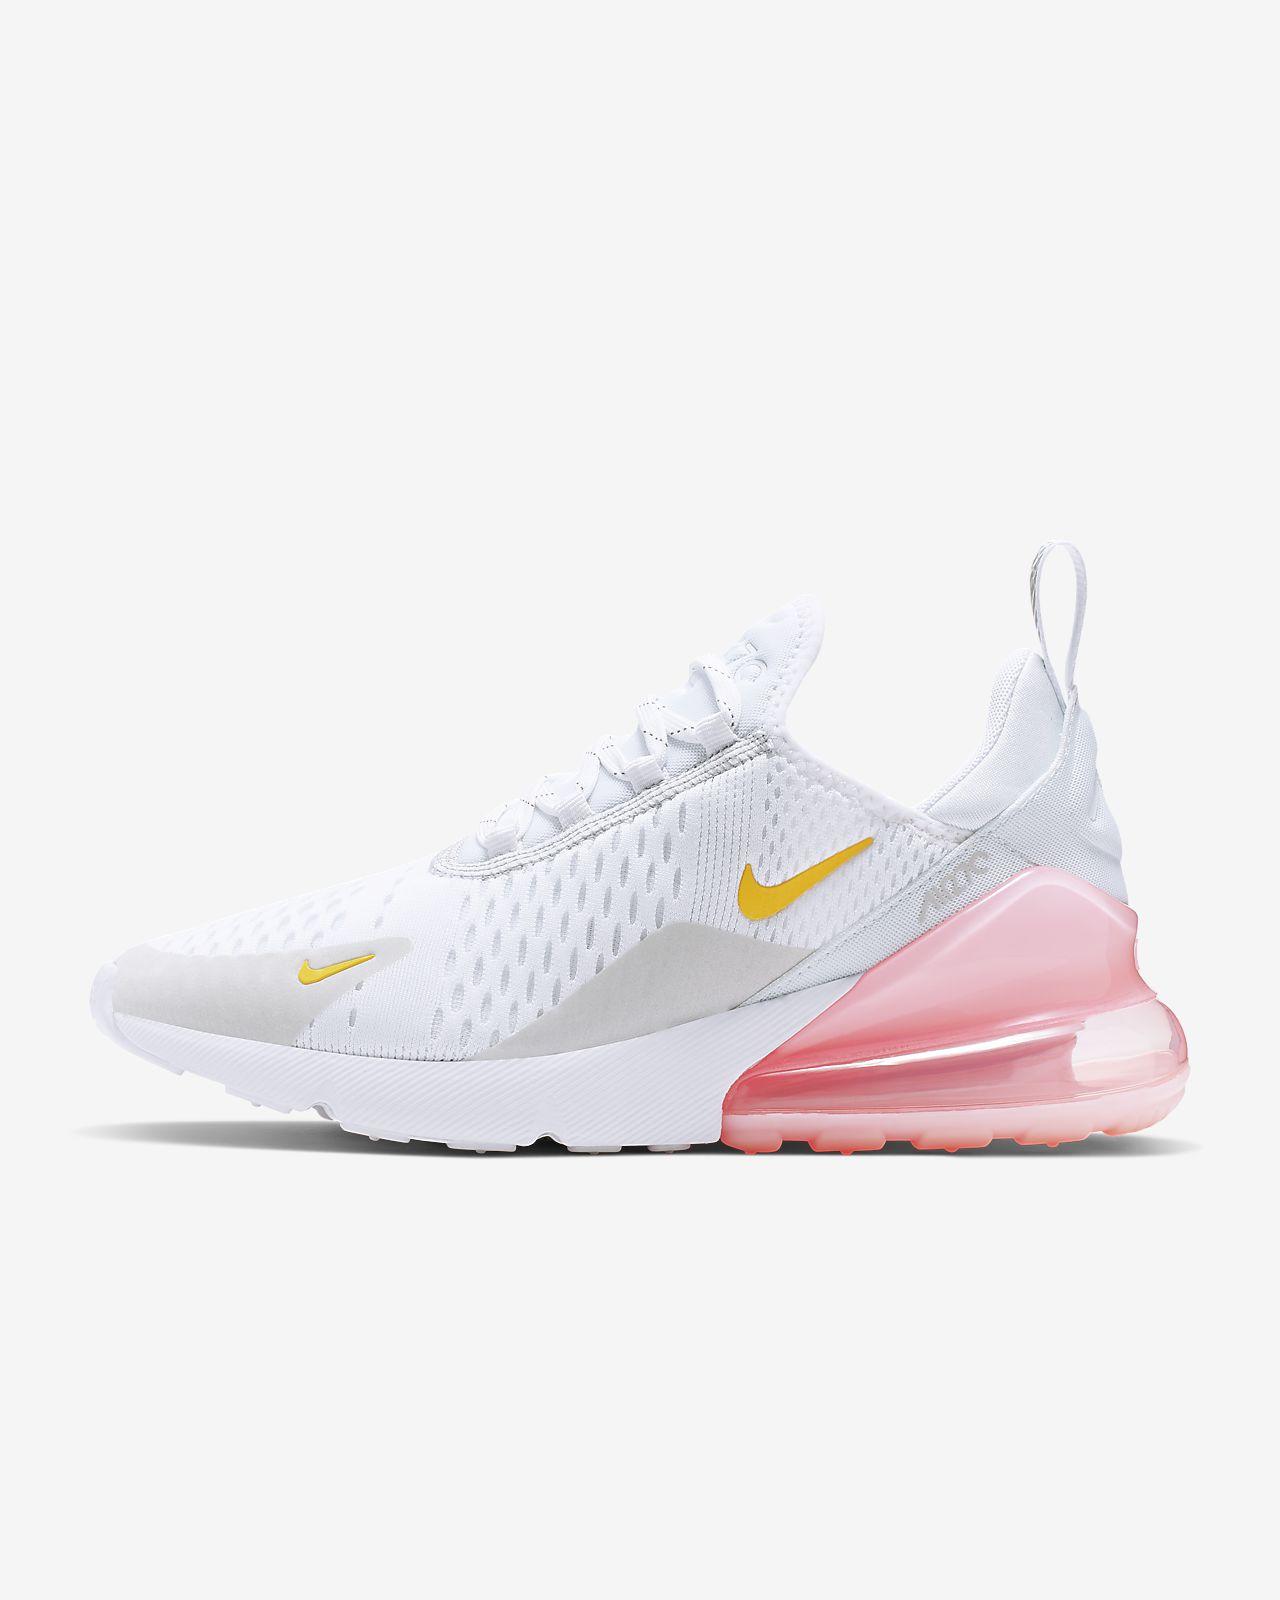 nike air max 90 blancas, Nike AIR MAX 270 Zapatillas Mujer